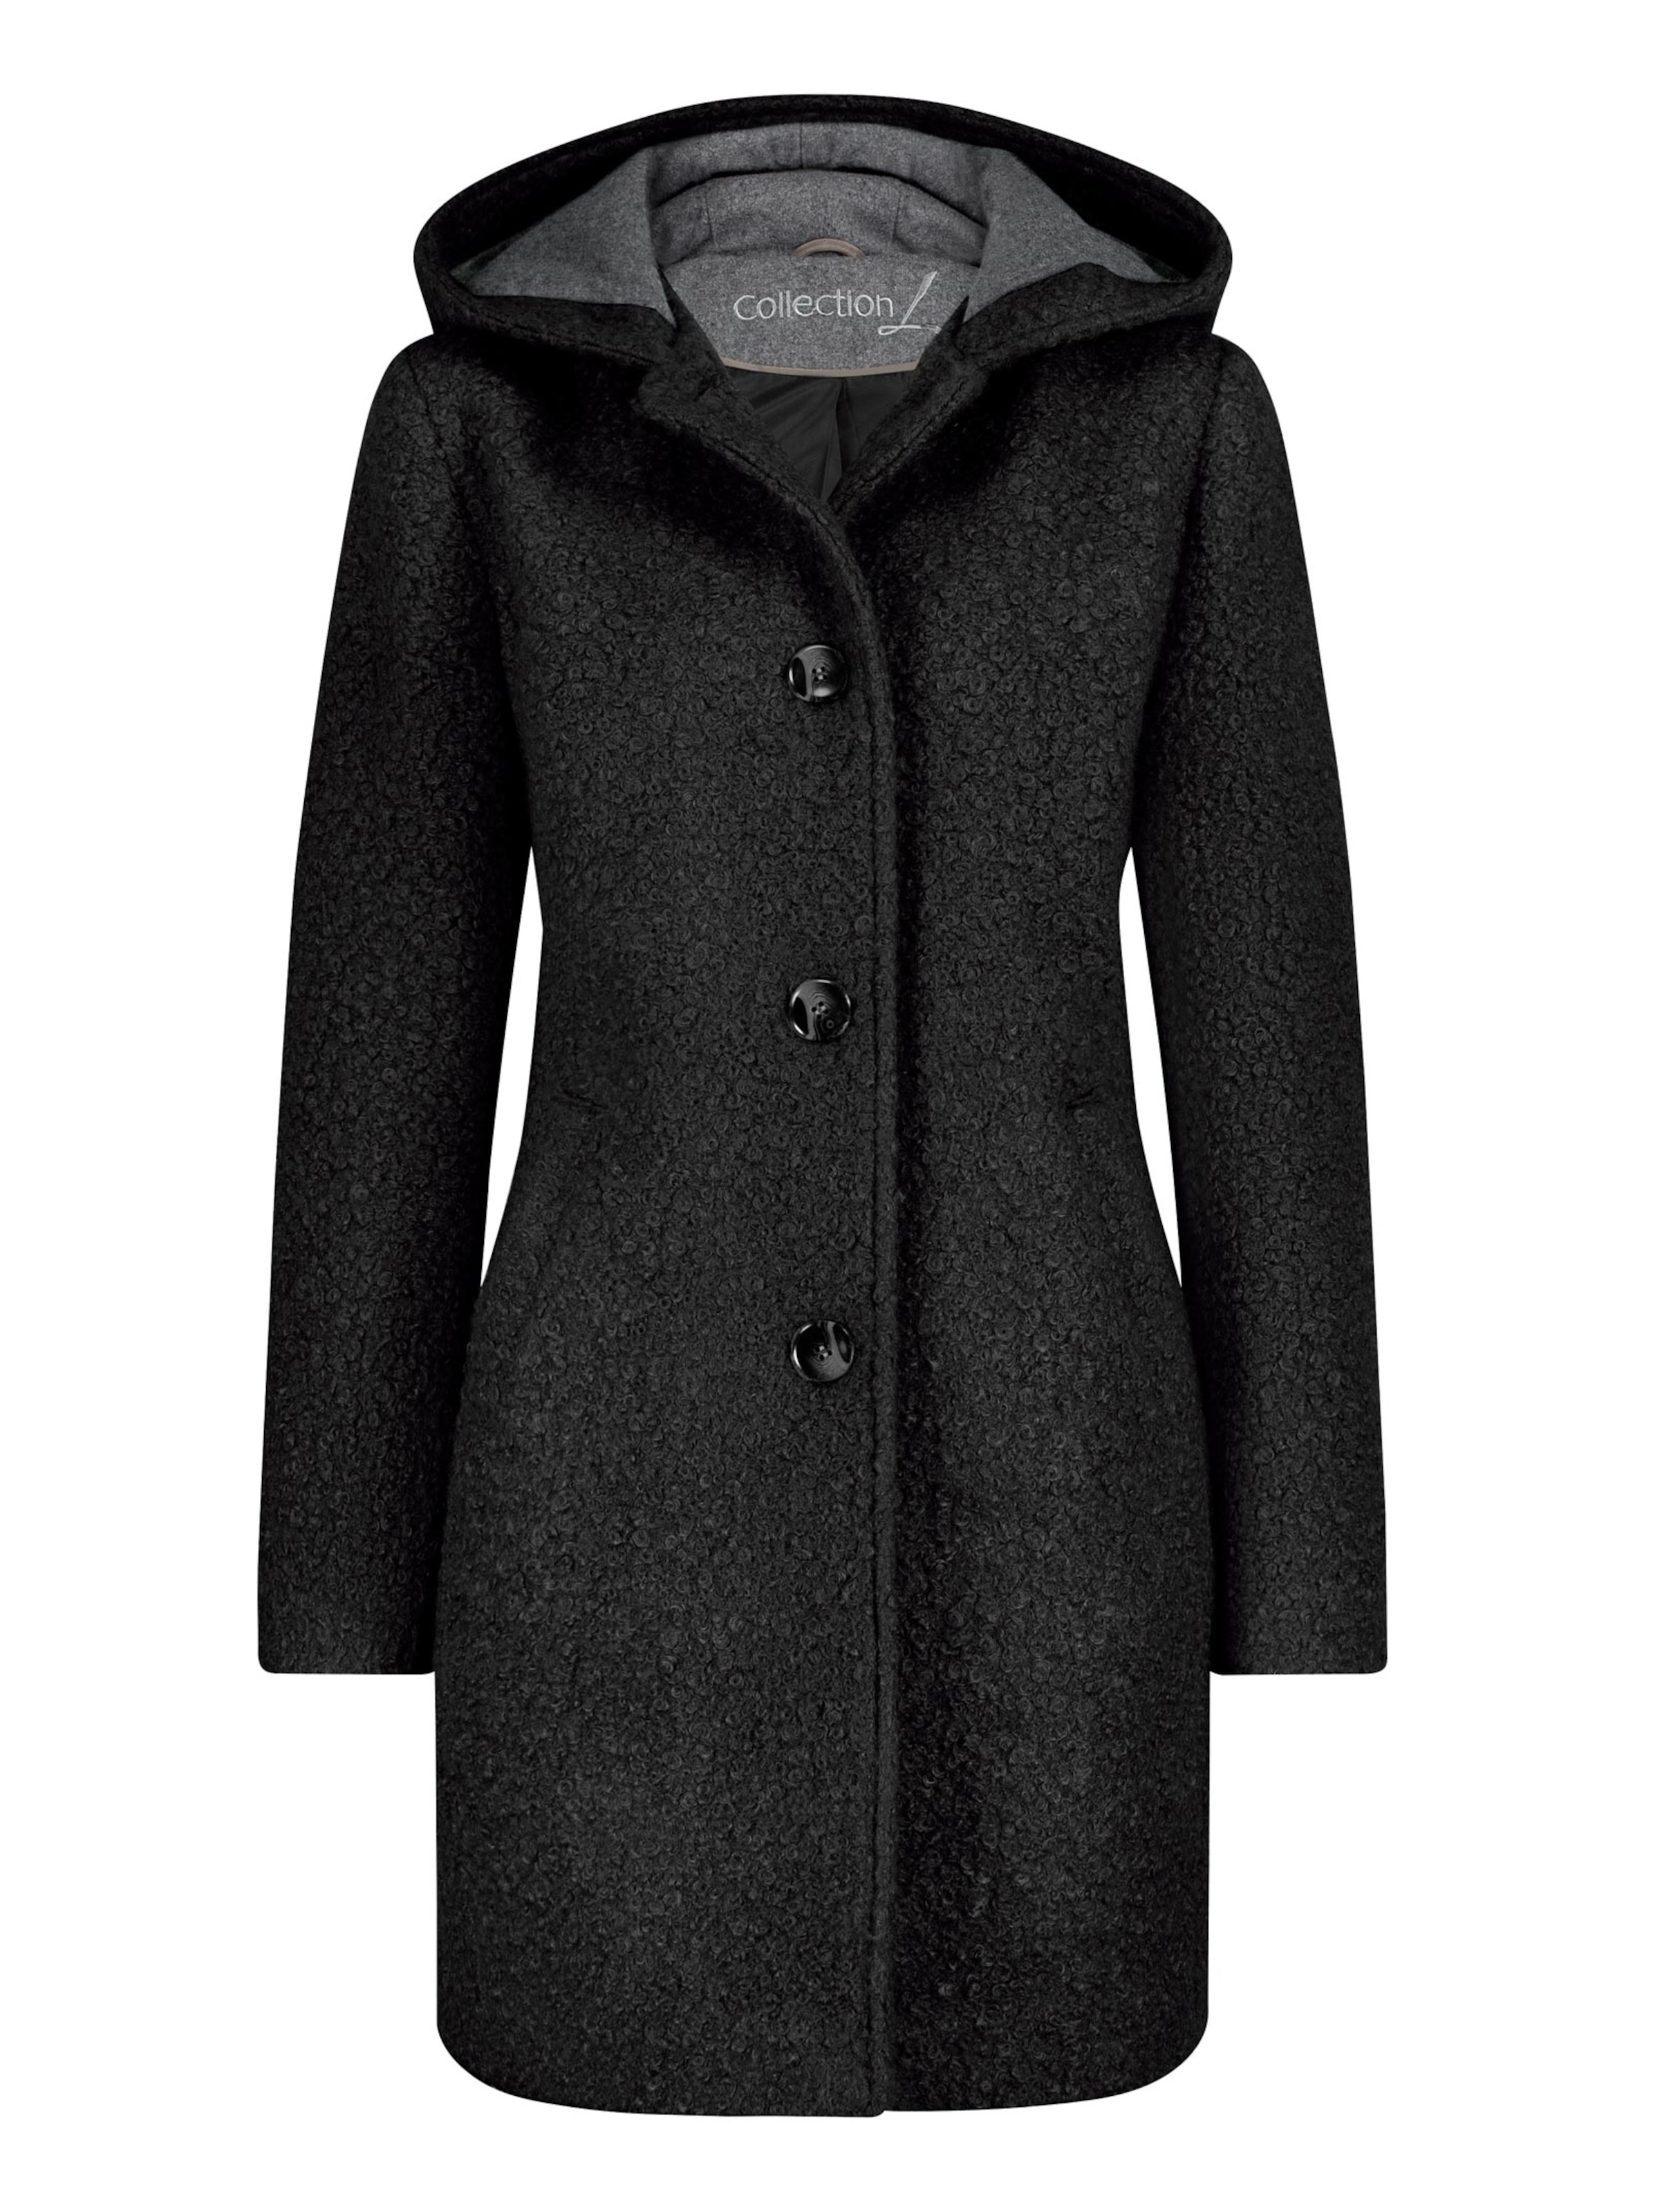 witt weiden -  Damen Jacke schwarz-grau